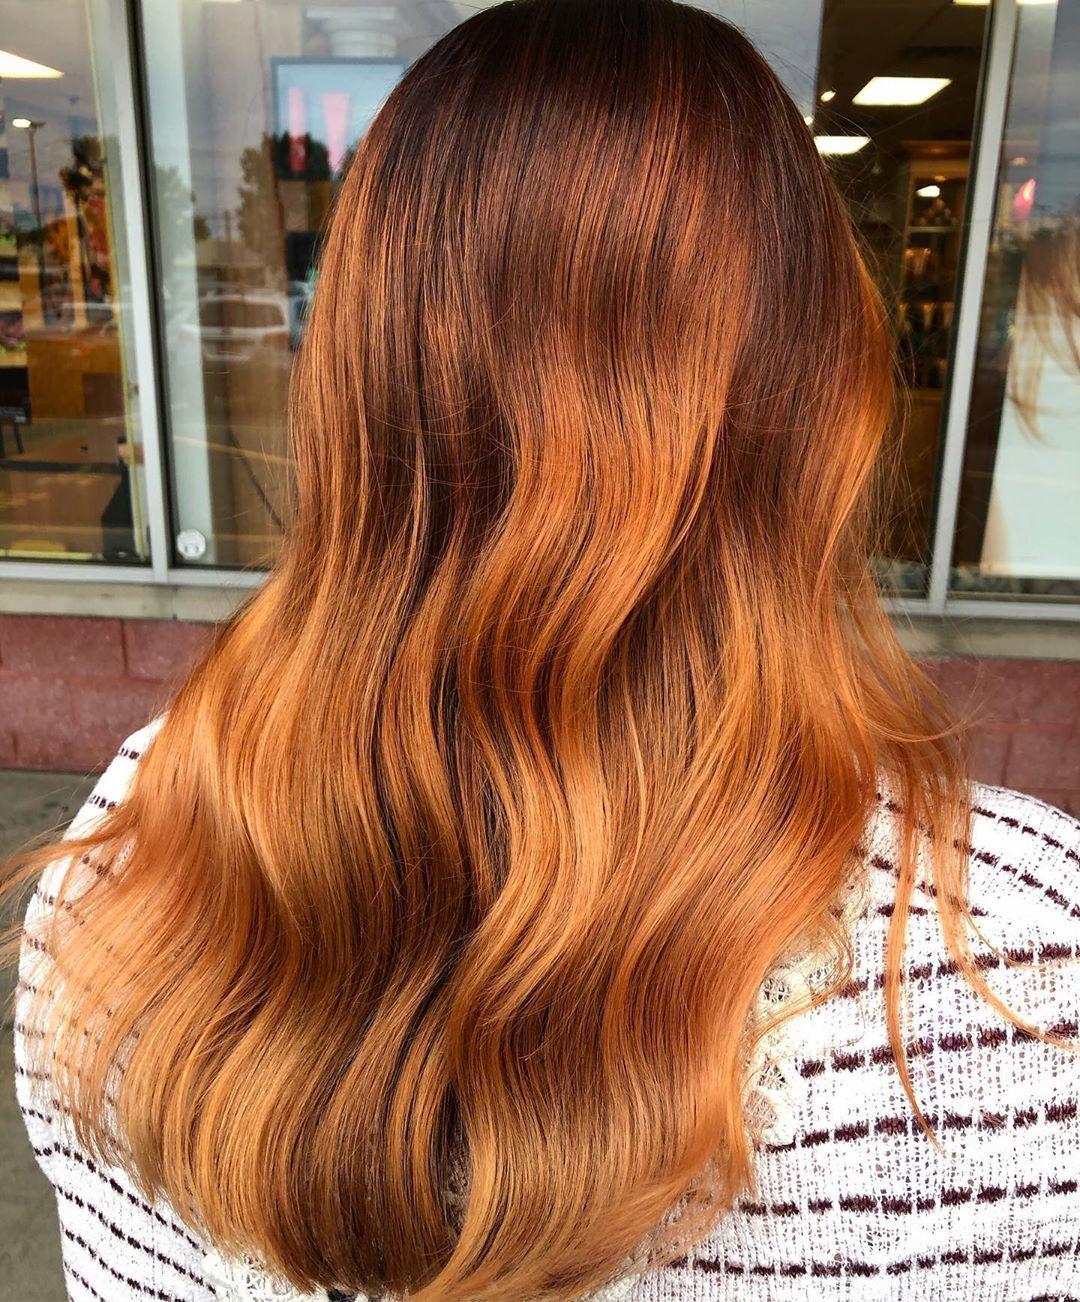 Woman with golden pumpkin spice hair colour